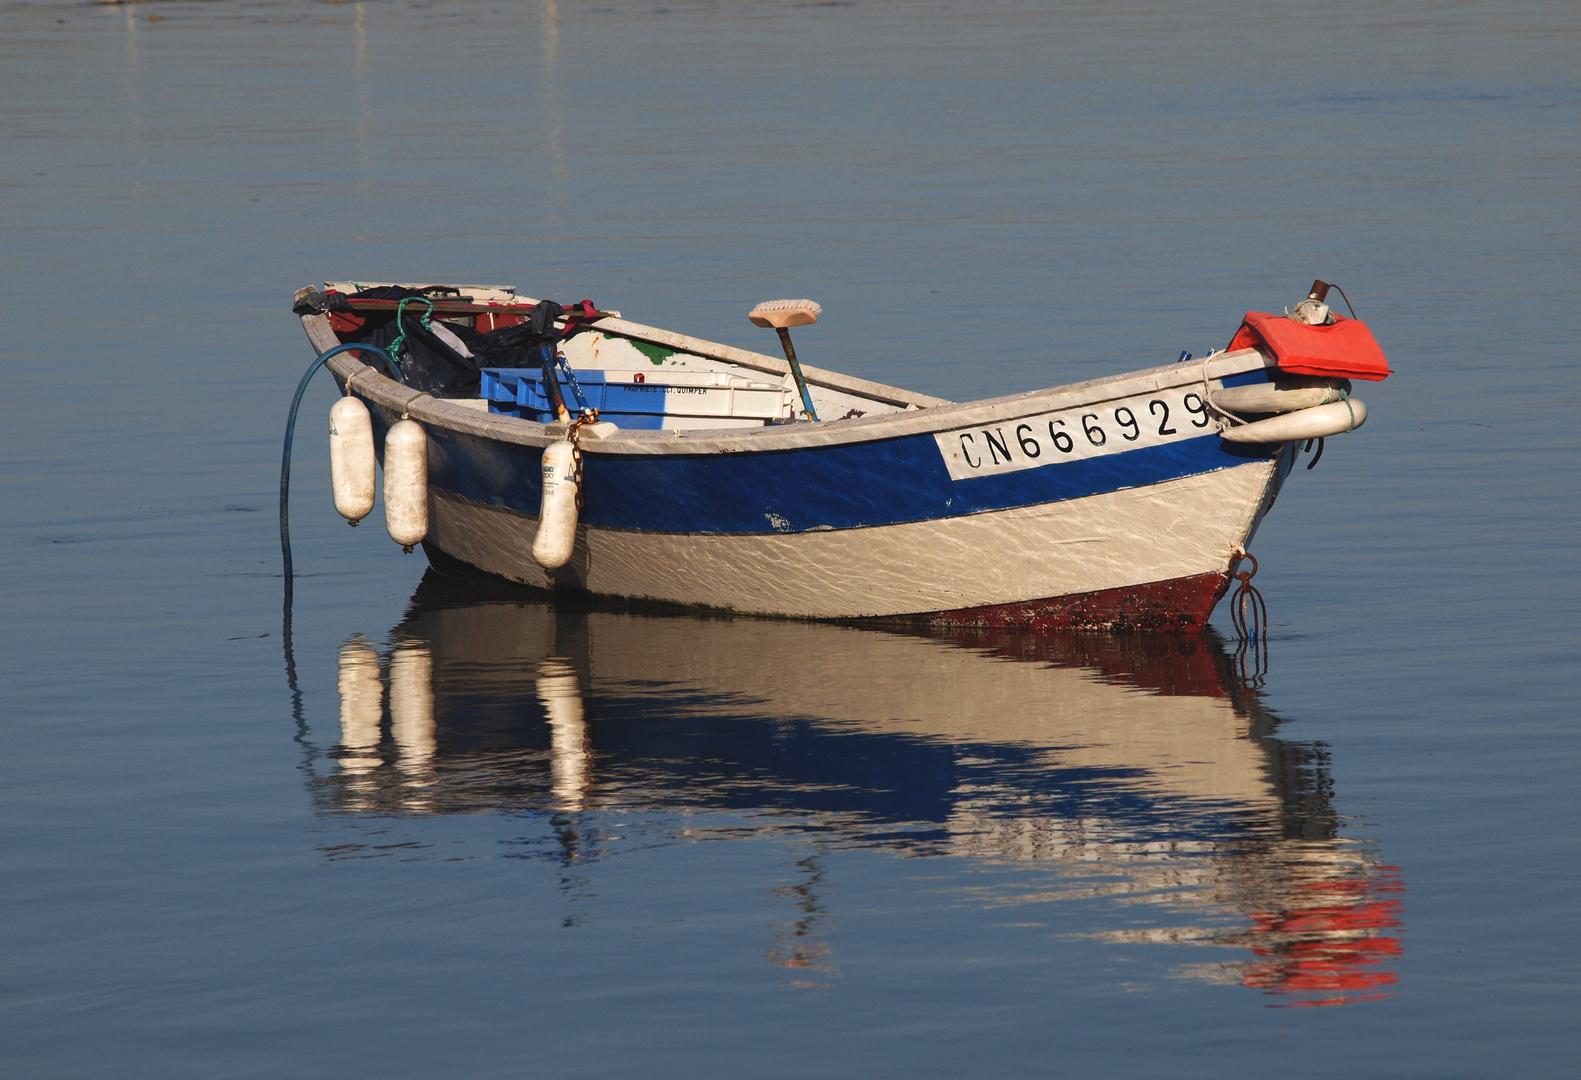 La barque et son reflet